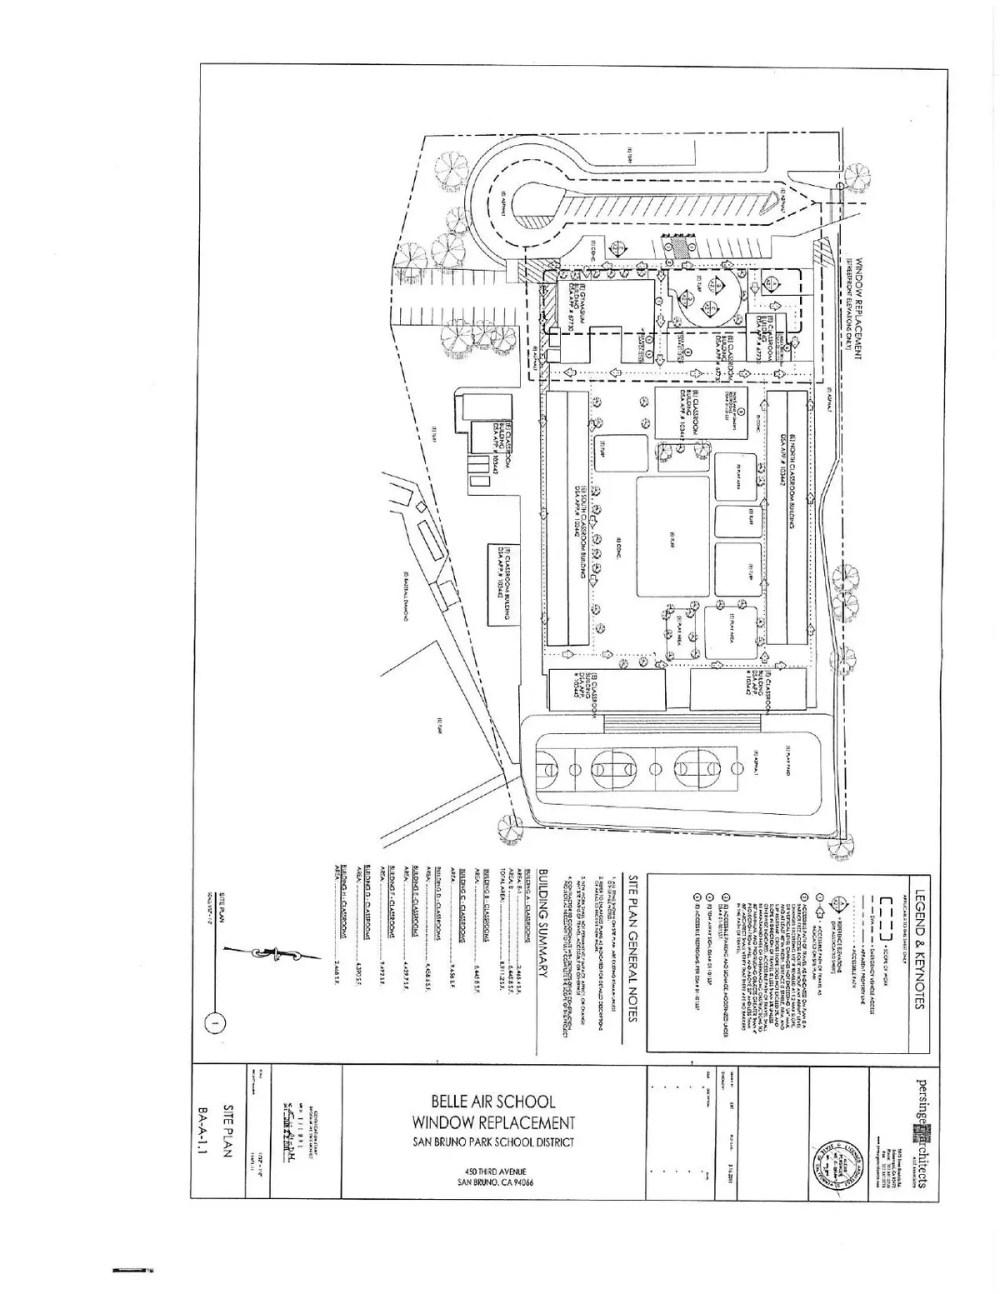 medium resolution of wrg 4232 schematic diagram 9790schematic diagram 9790 7